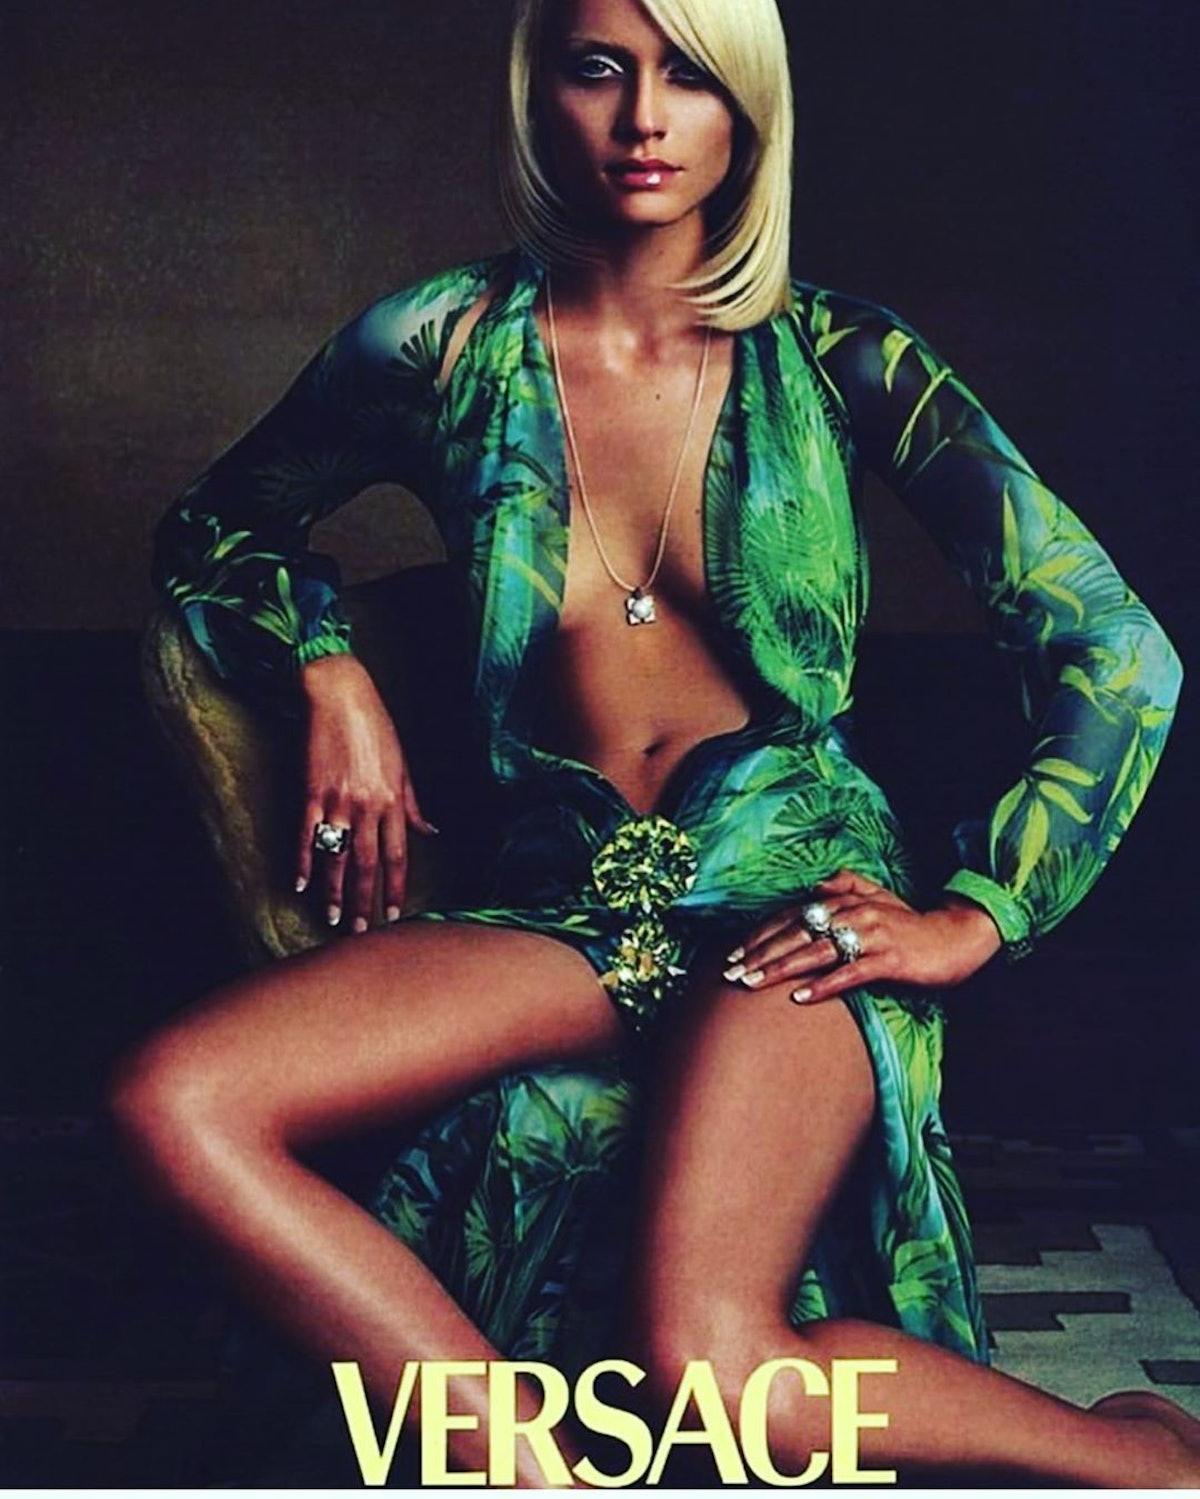 amber-valletta-versace-campaign.jpg